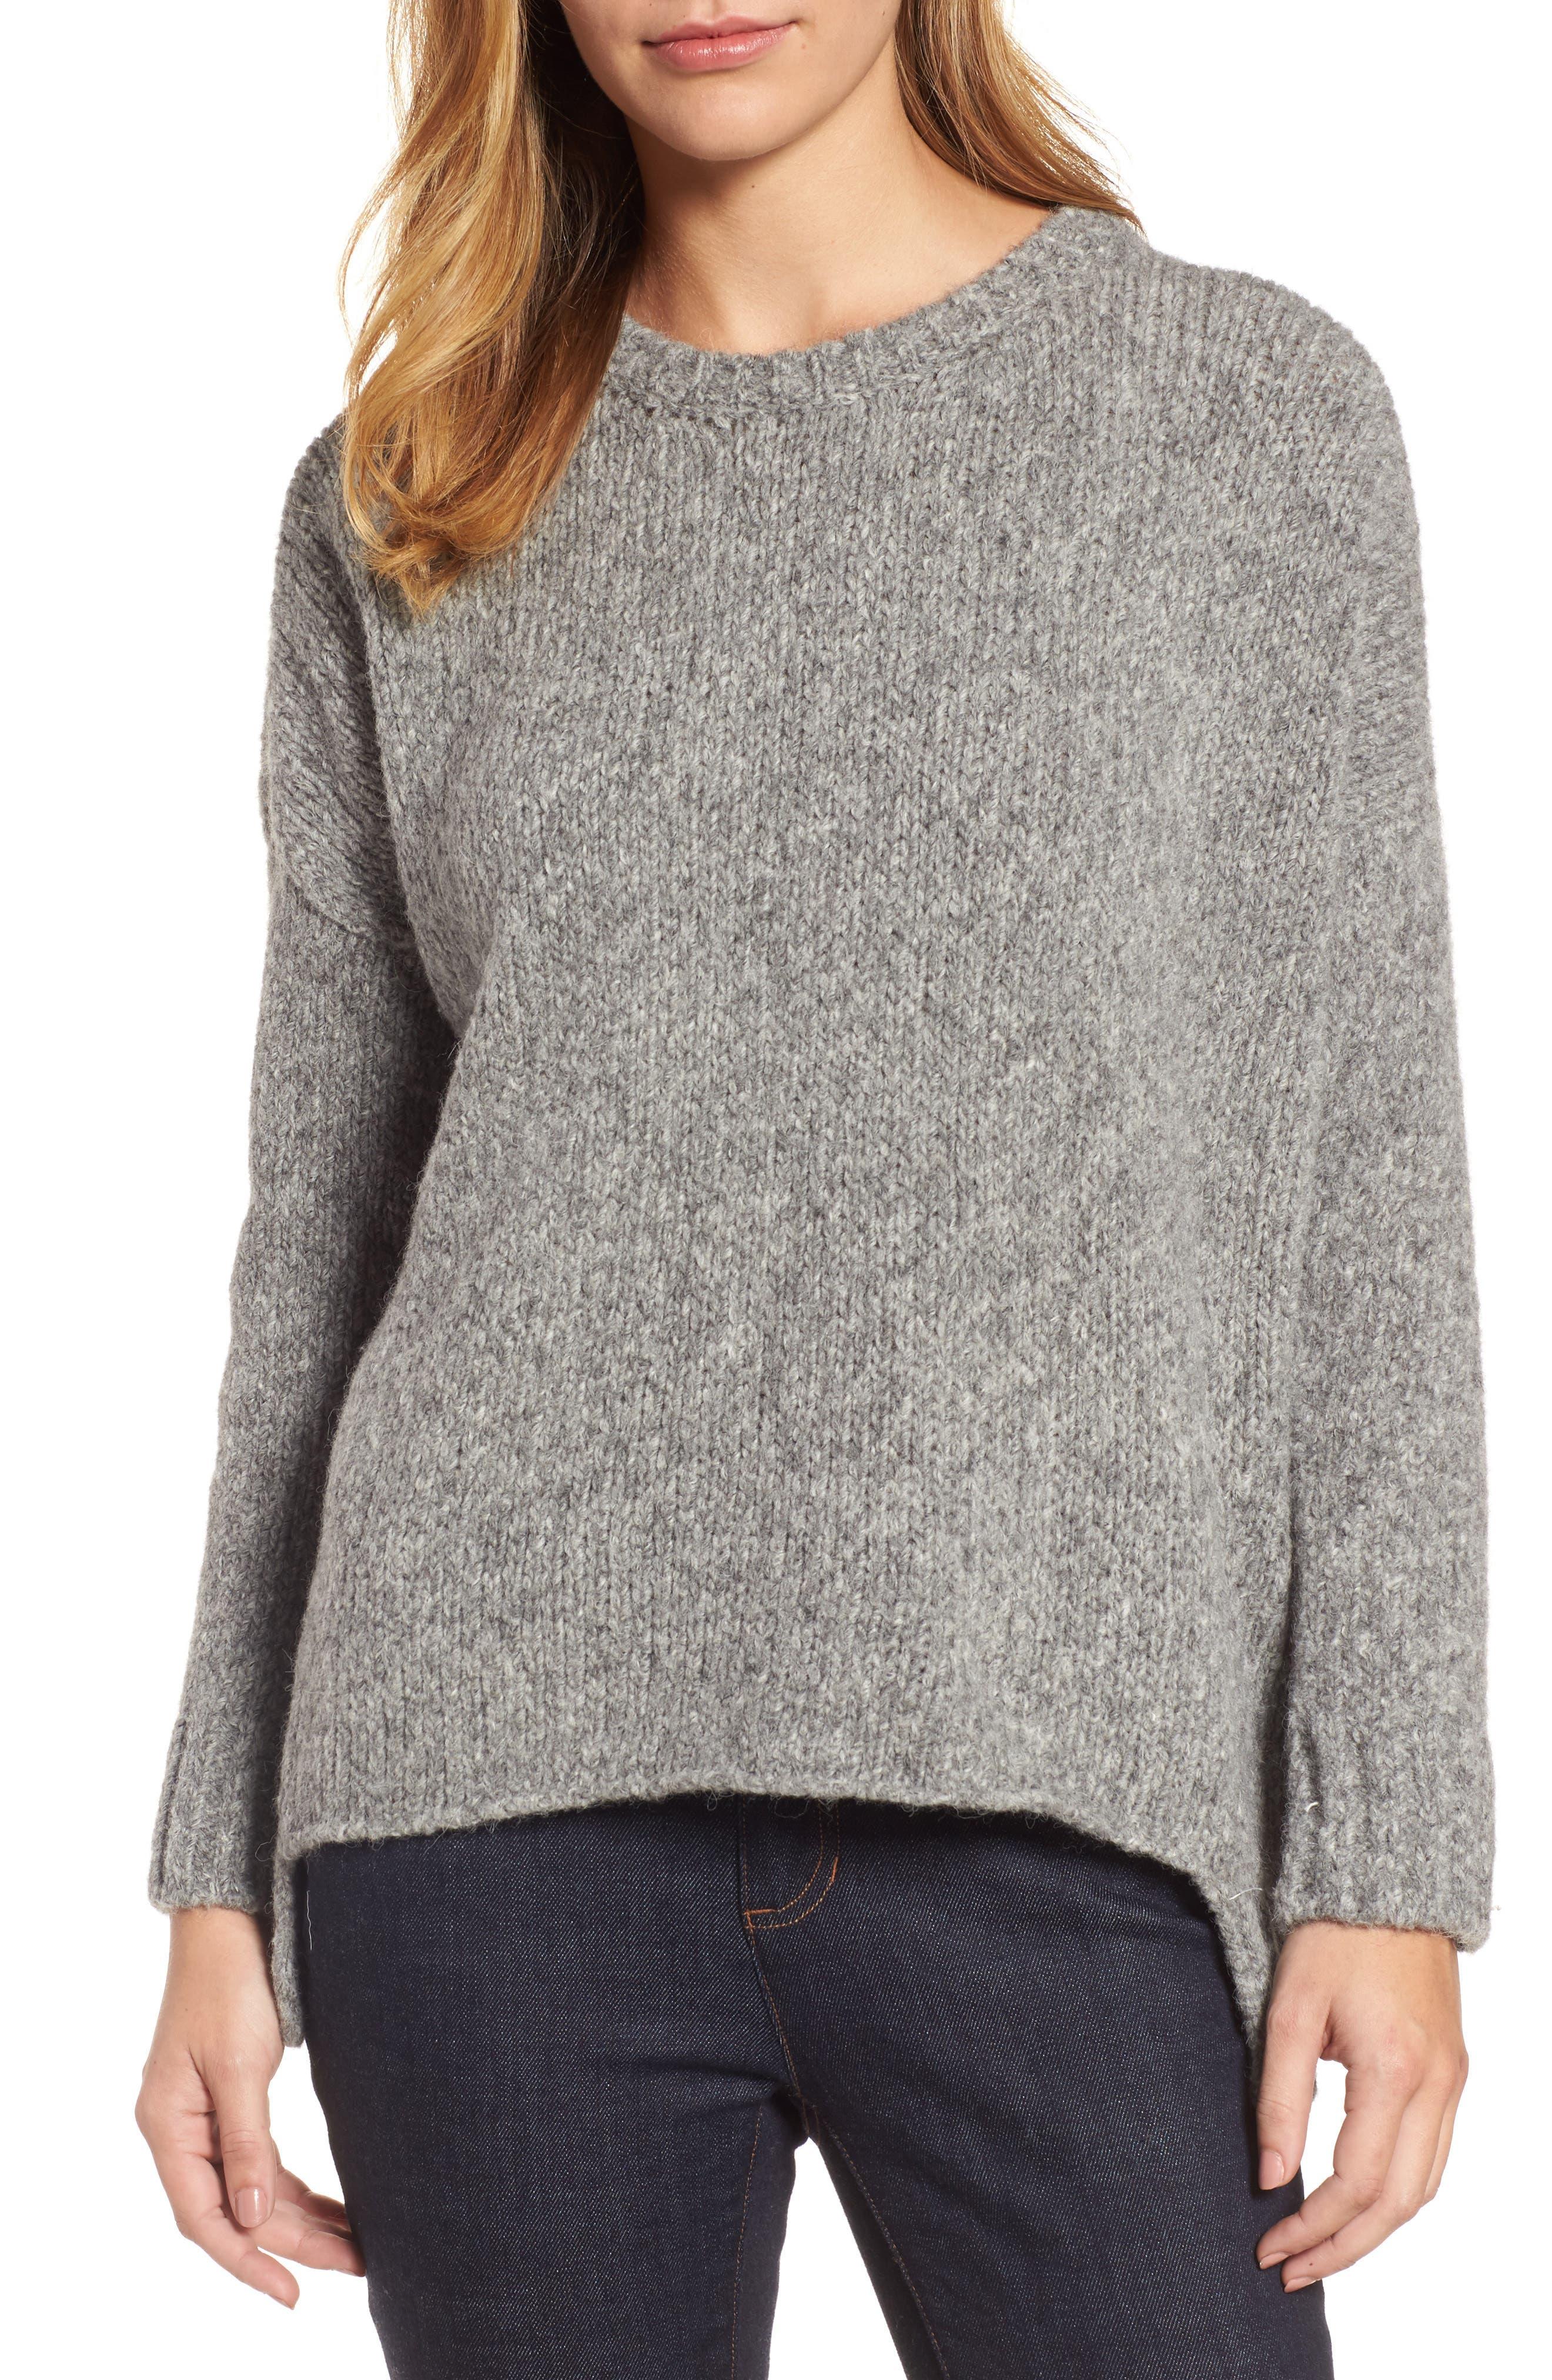 Eileen Fisher High/Low Alpaca Blend Sweater